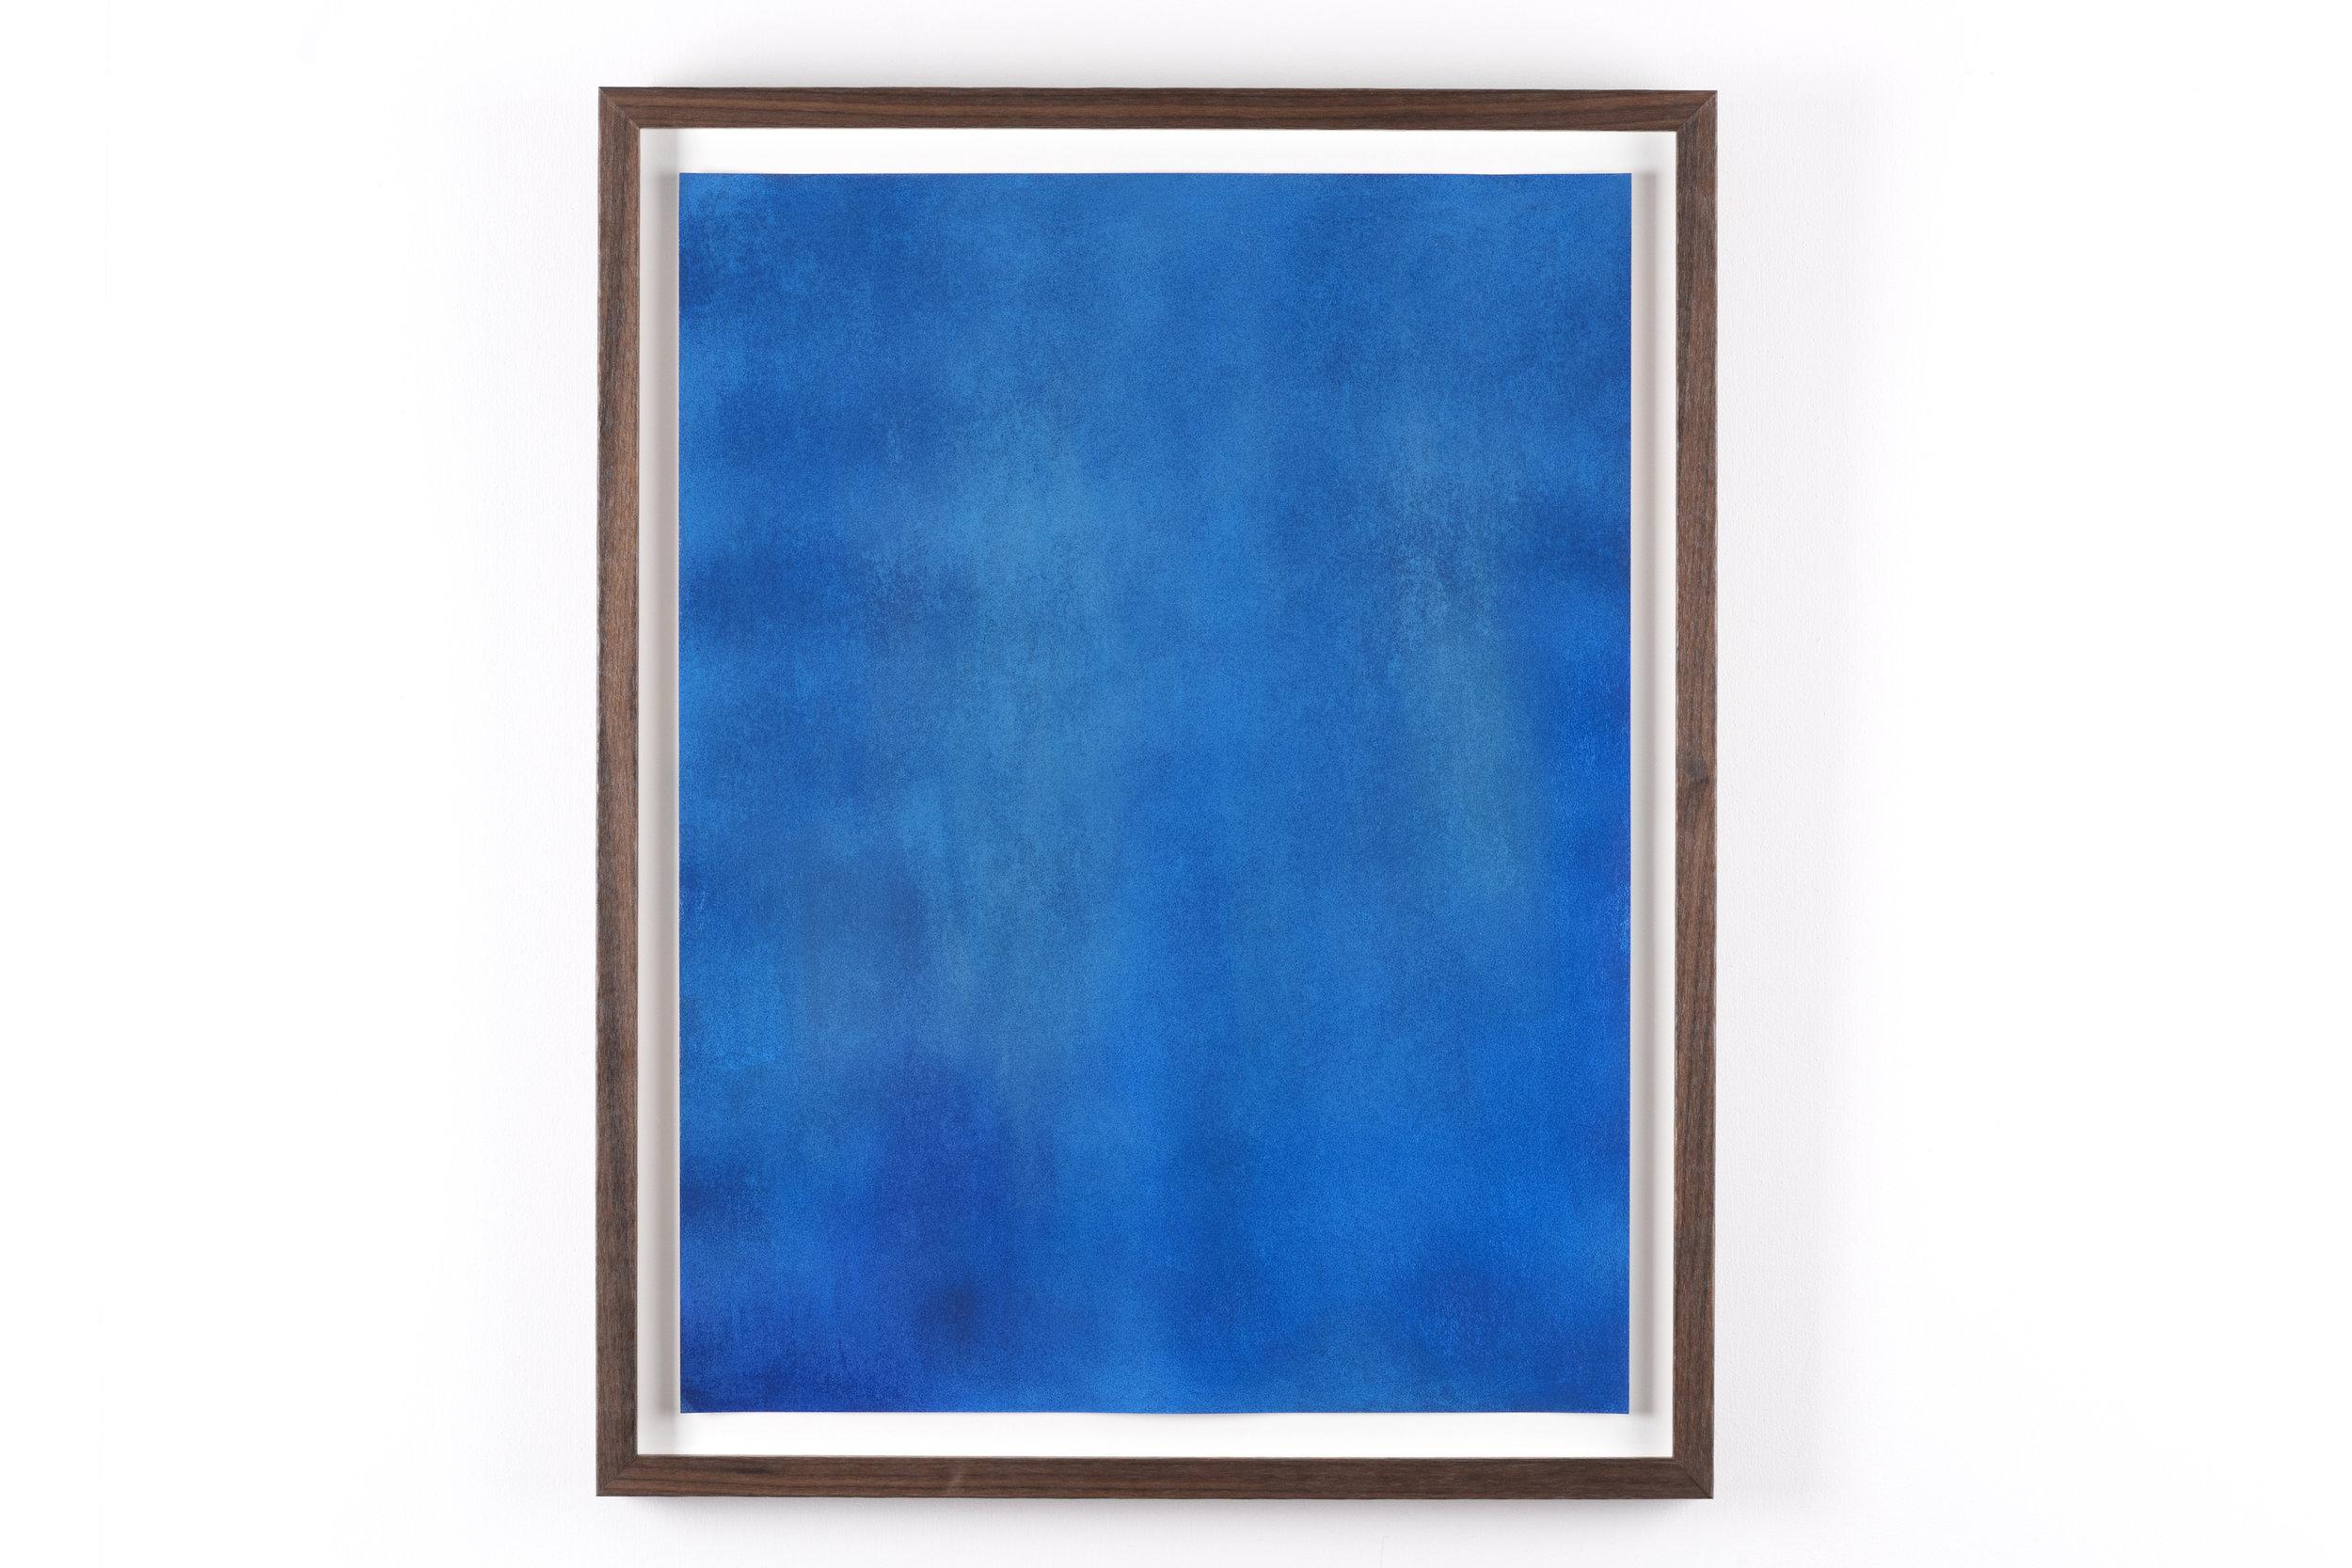 Dry pastel on paper, walnut frame, 2016  Photo: Jan Inge Haga